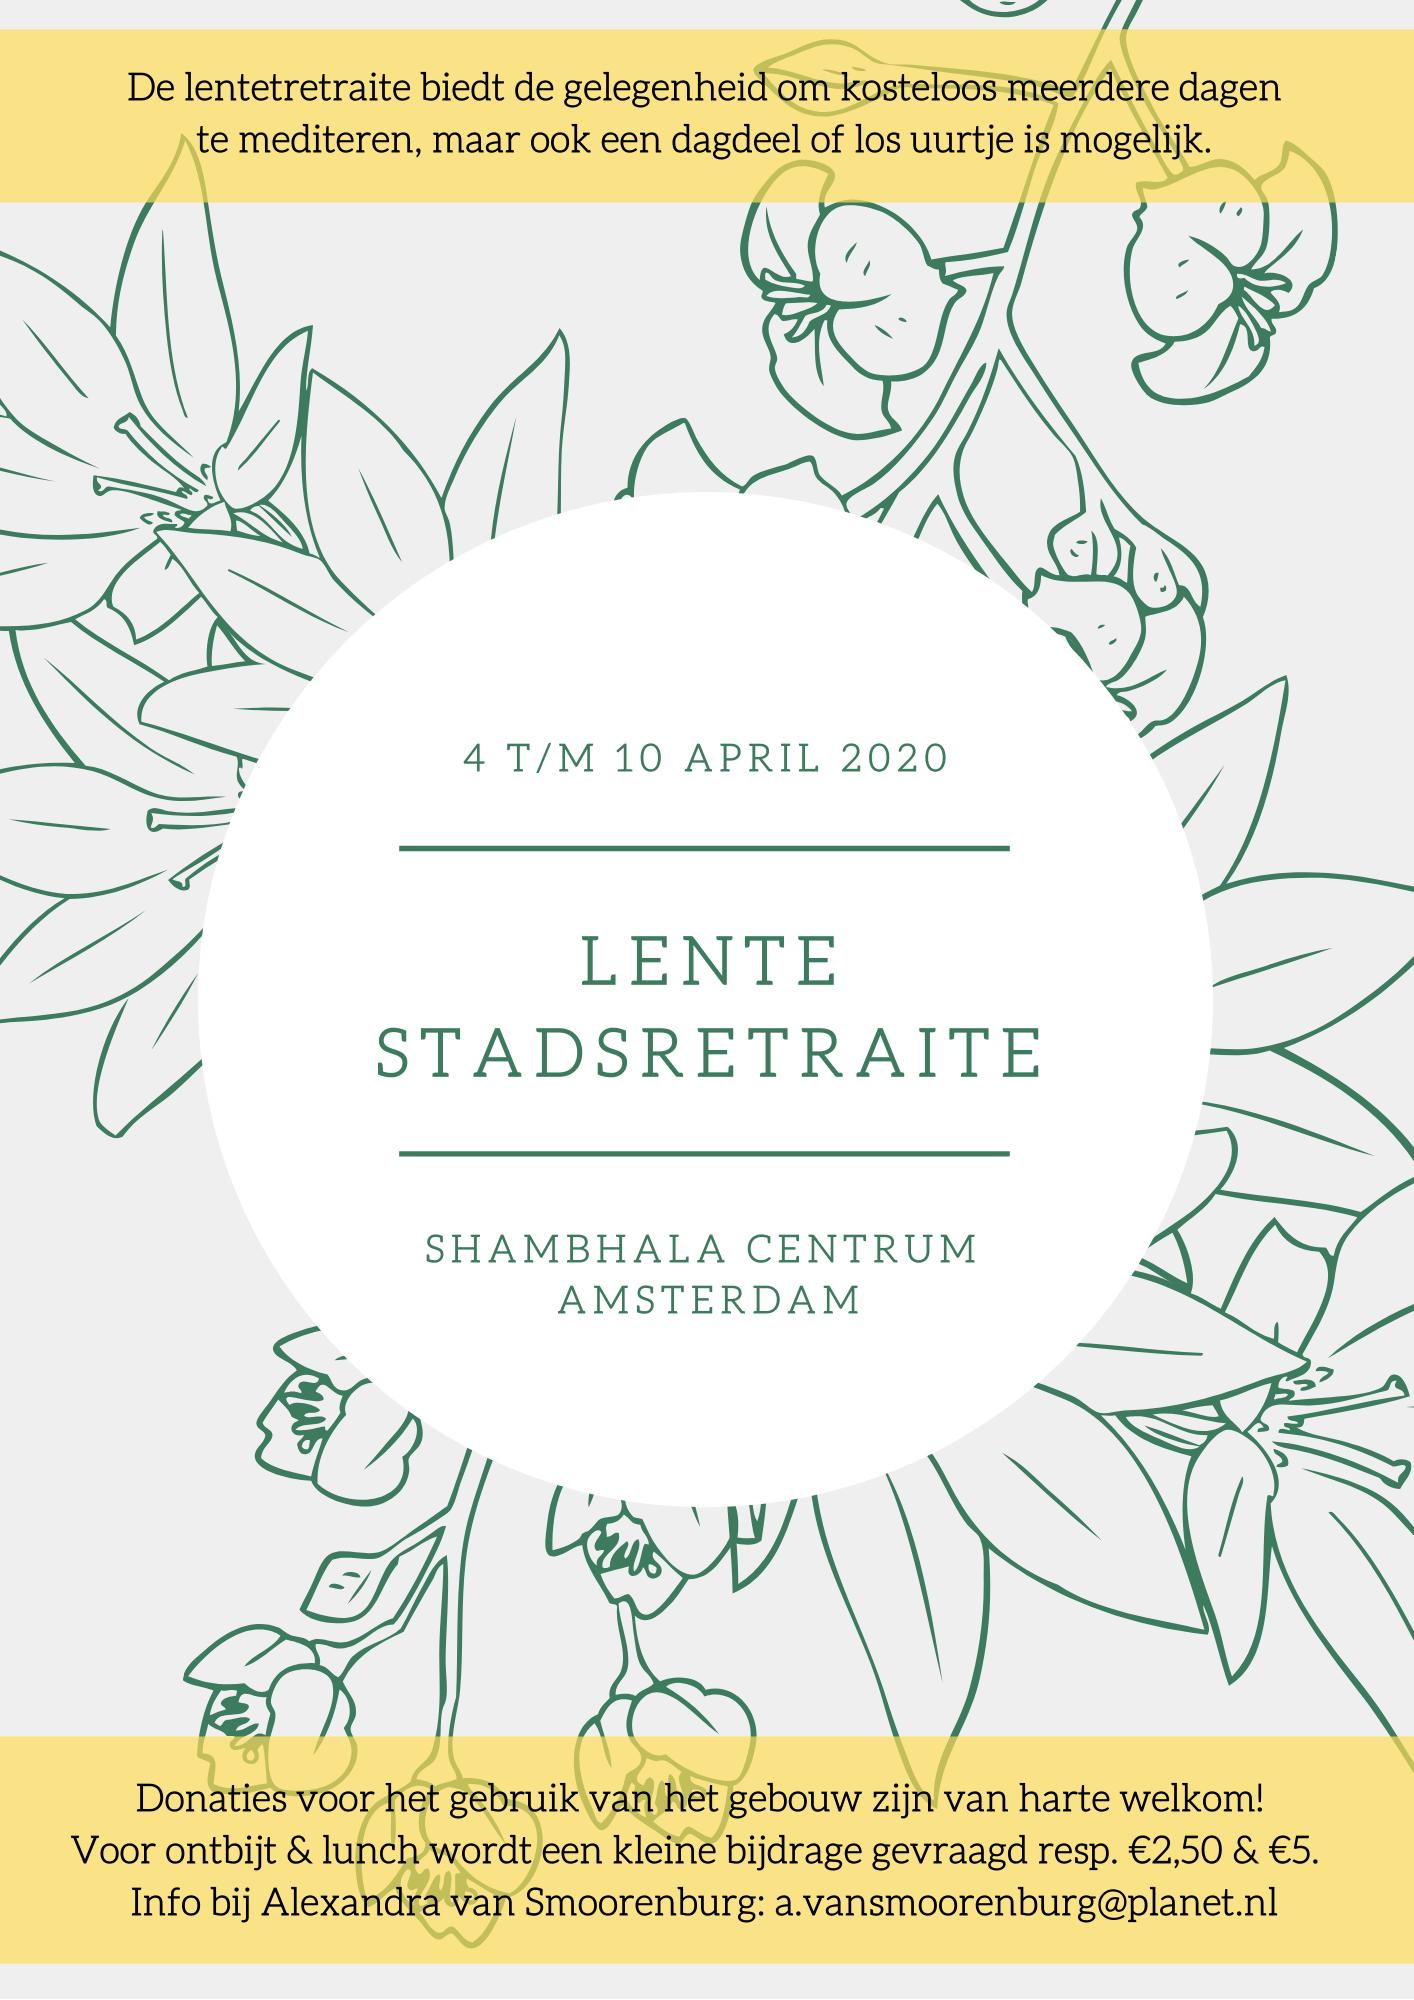 Amsterdam/Stadsretraite_lente_2020_1.png